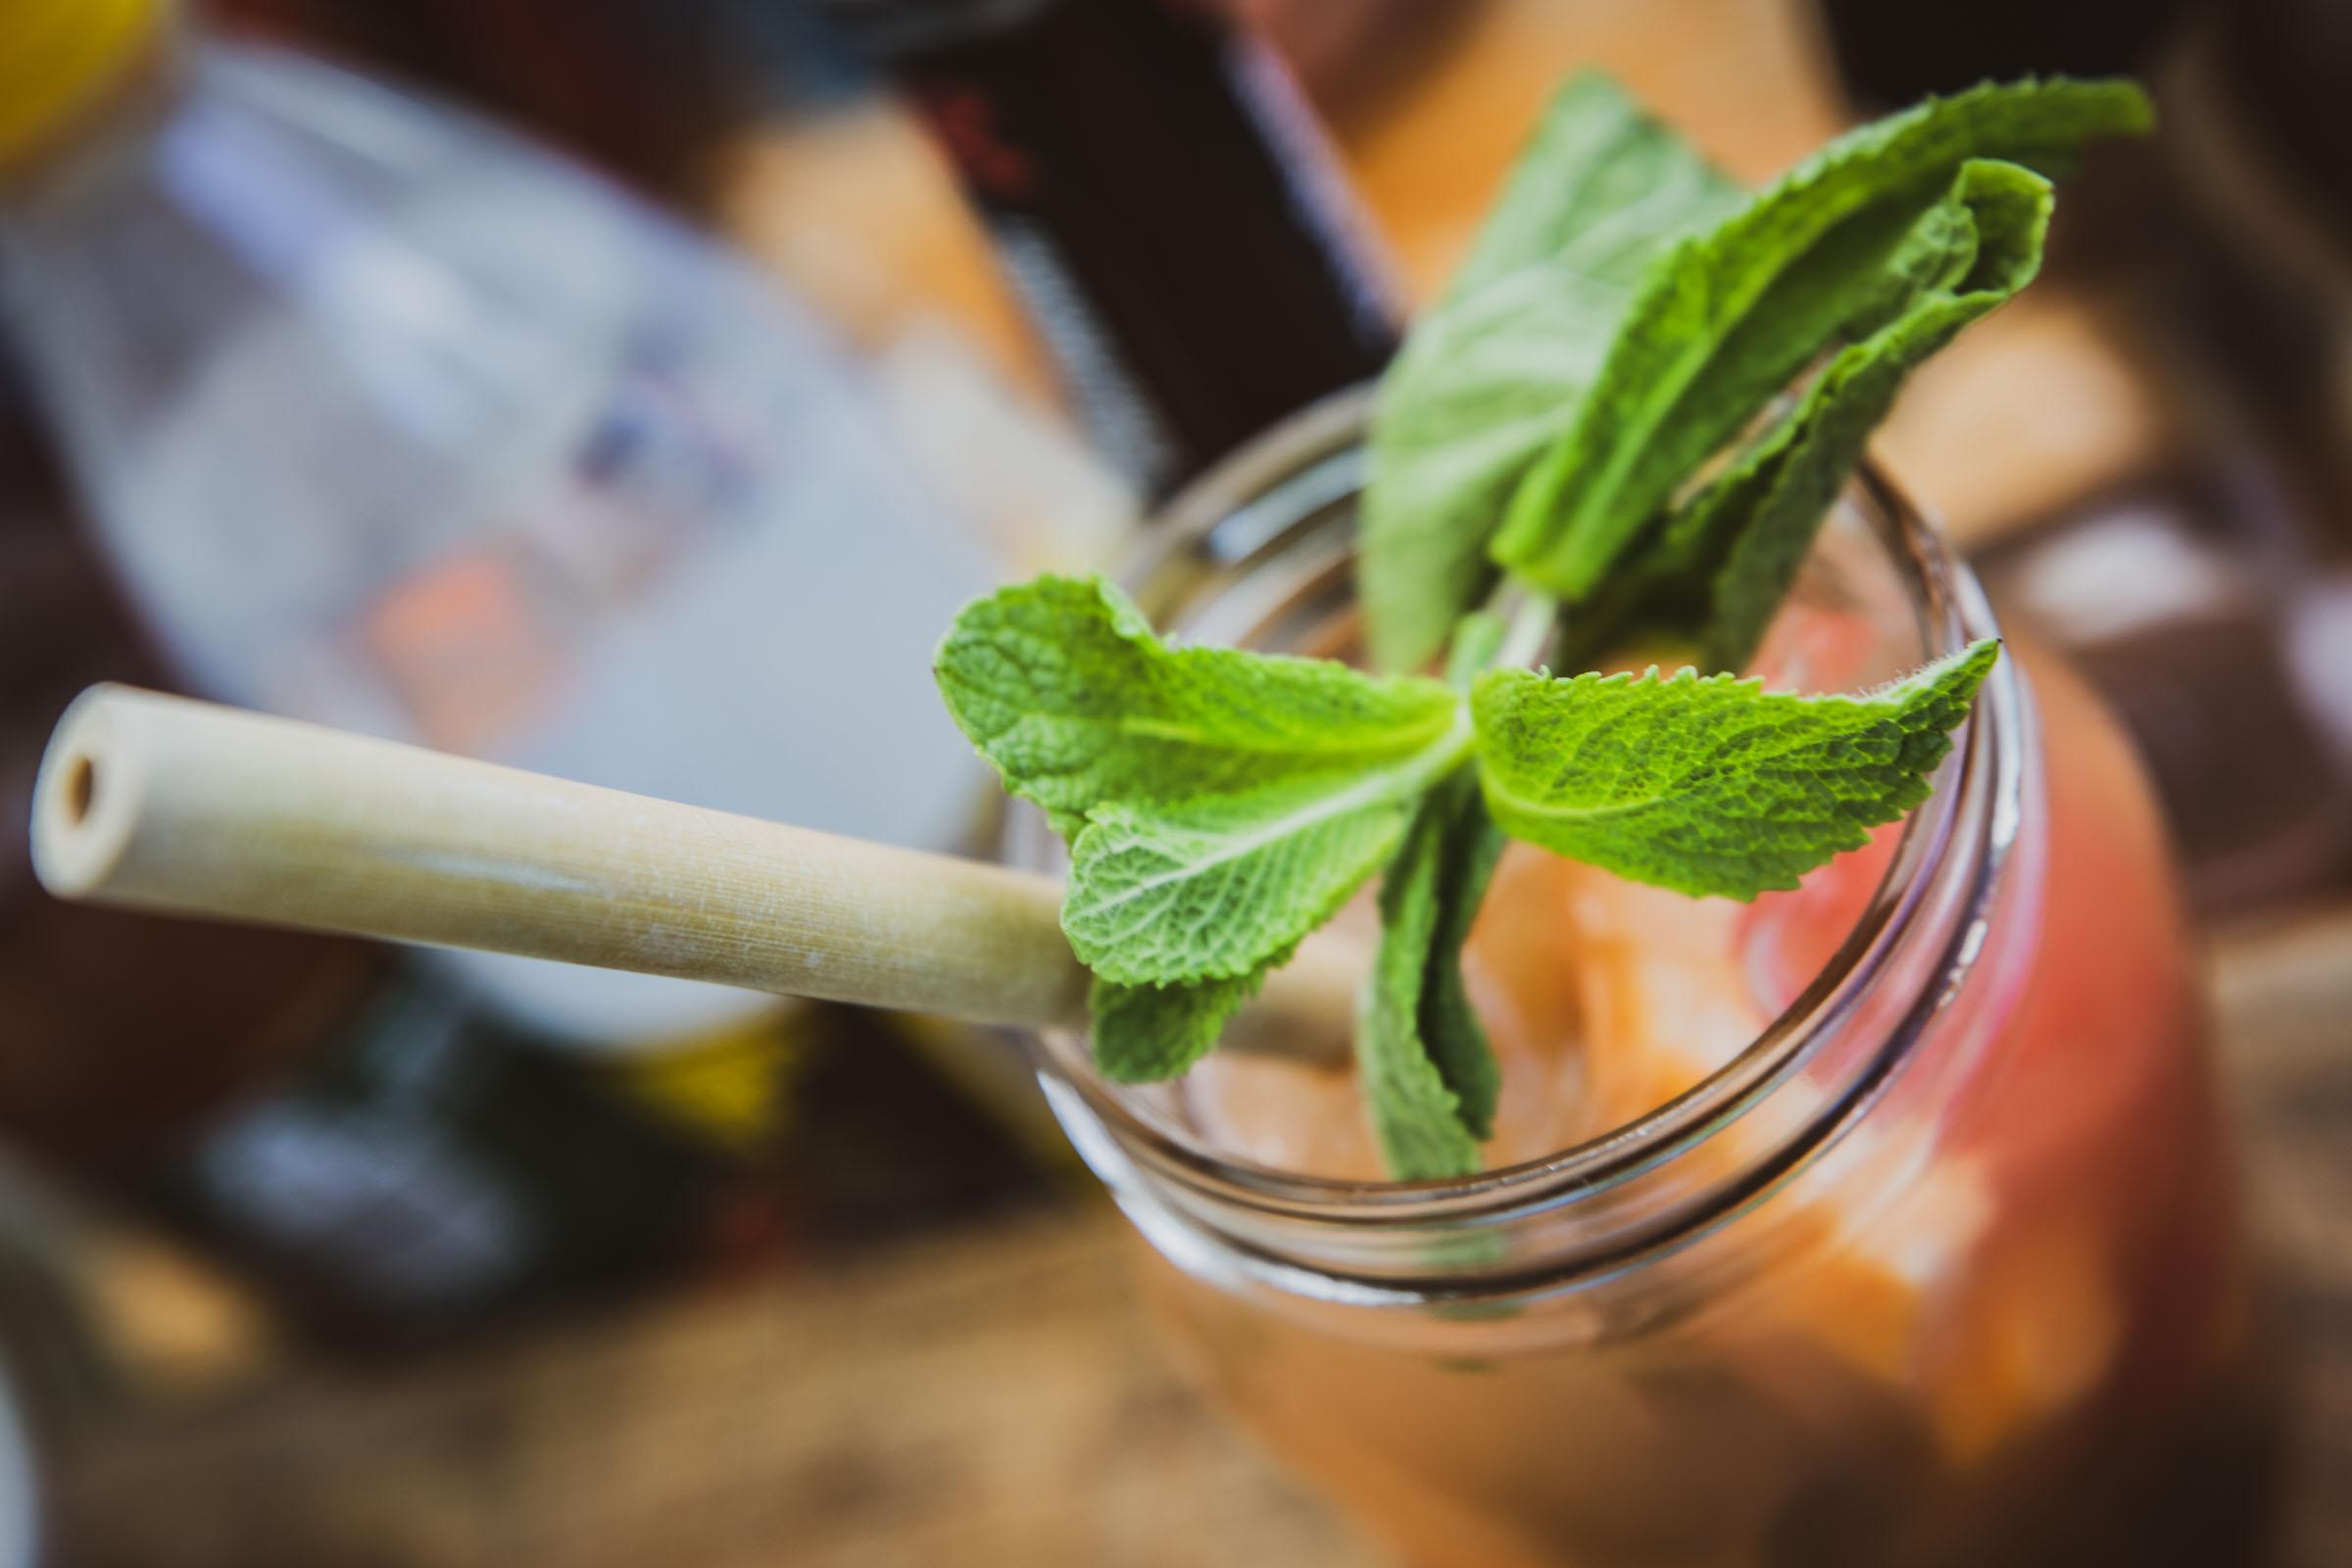 Barformat - Mobile | Bar | Cocktailservice | Hannover | Getränke | Catering | Cocktails | Wein | Aperitif | Gin | Kaffee | Softdrinks | Foodtruck | Hochzeit | Messe | Firmenfeier | Buchen | Mieten | Anfragen